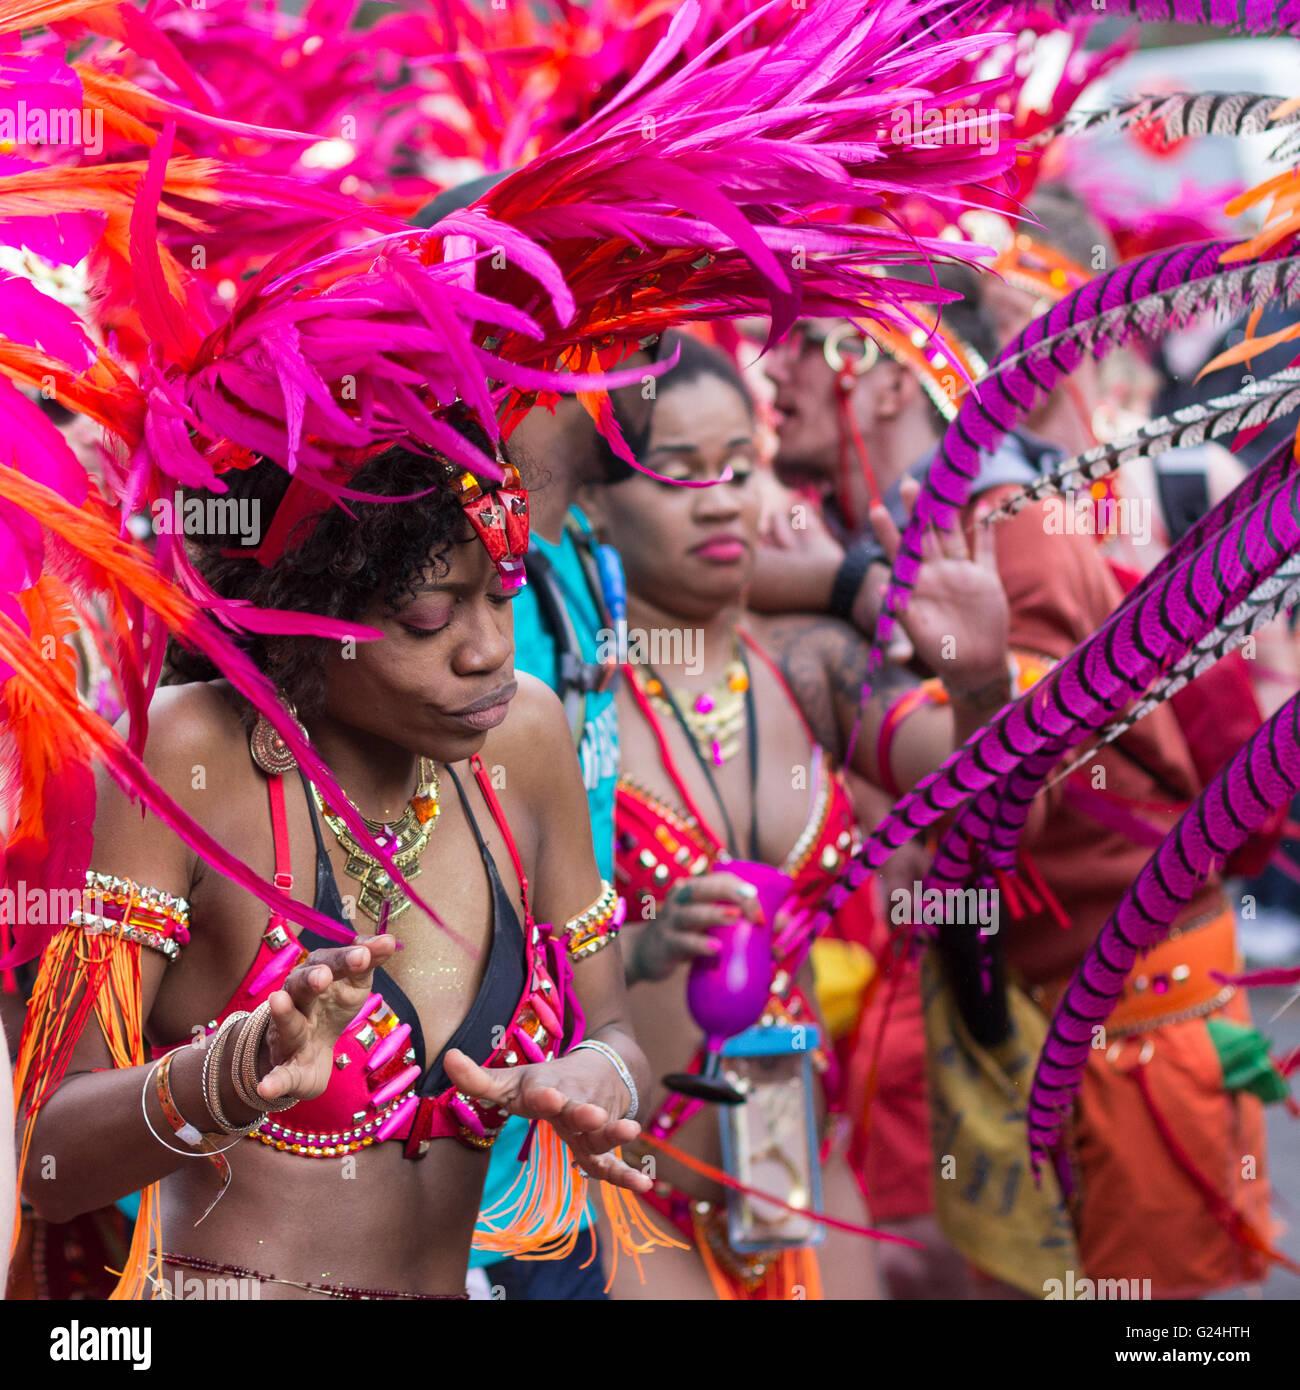 Portrait de femme dansant en costume Carnaval des Cultures (Karneval der Kulturen) à Berlin, Allemagne. Photo Stock